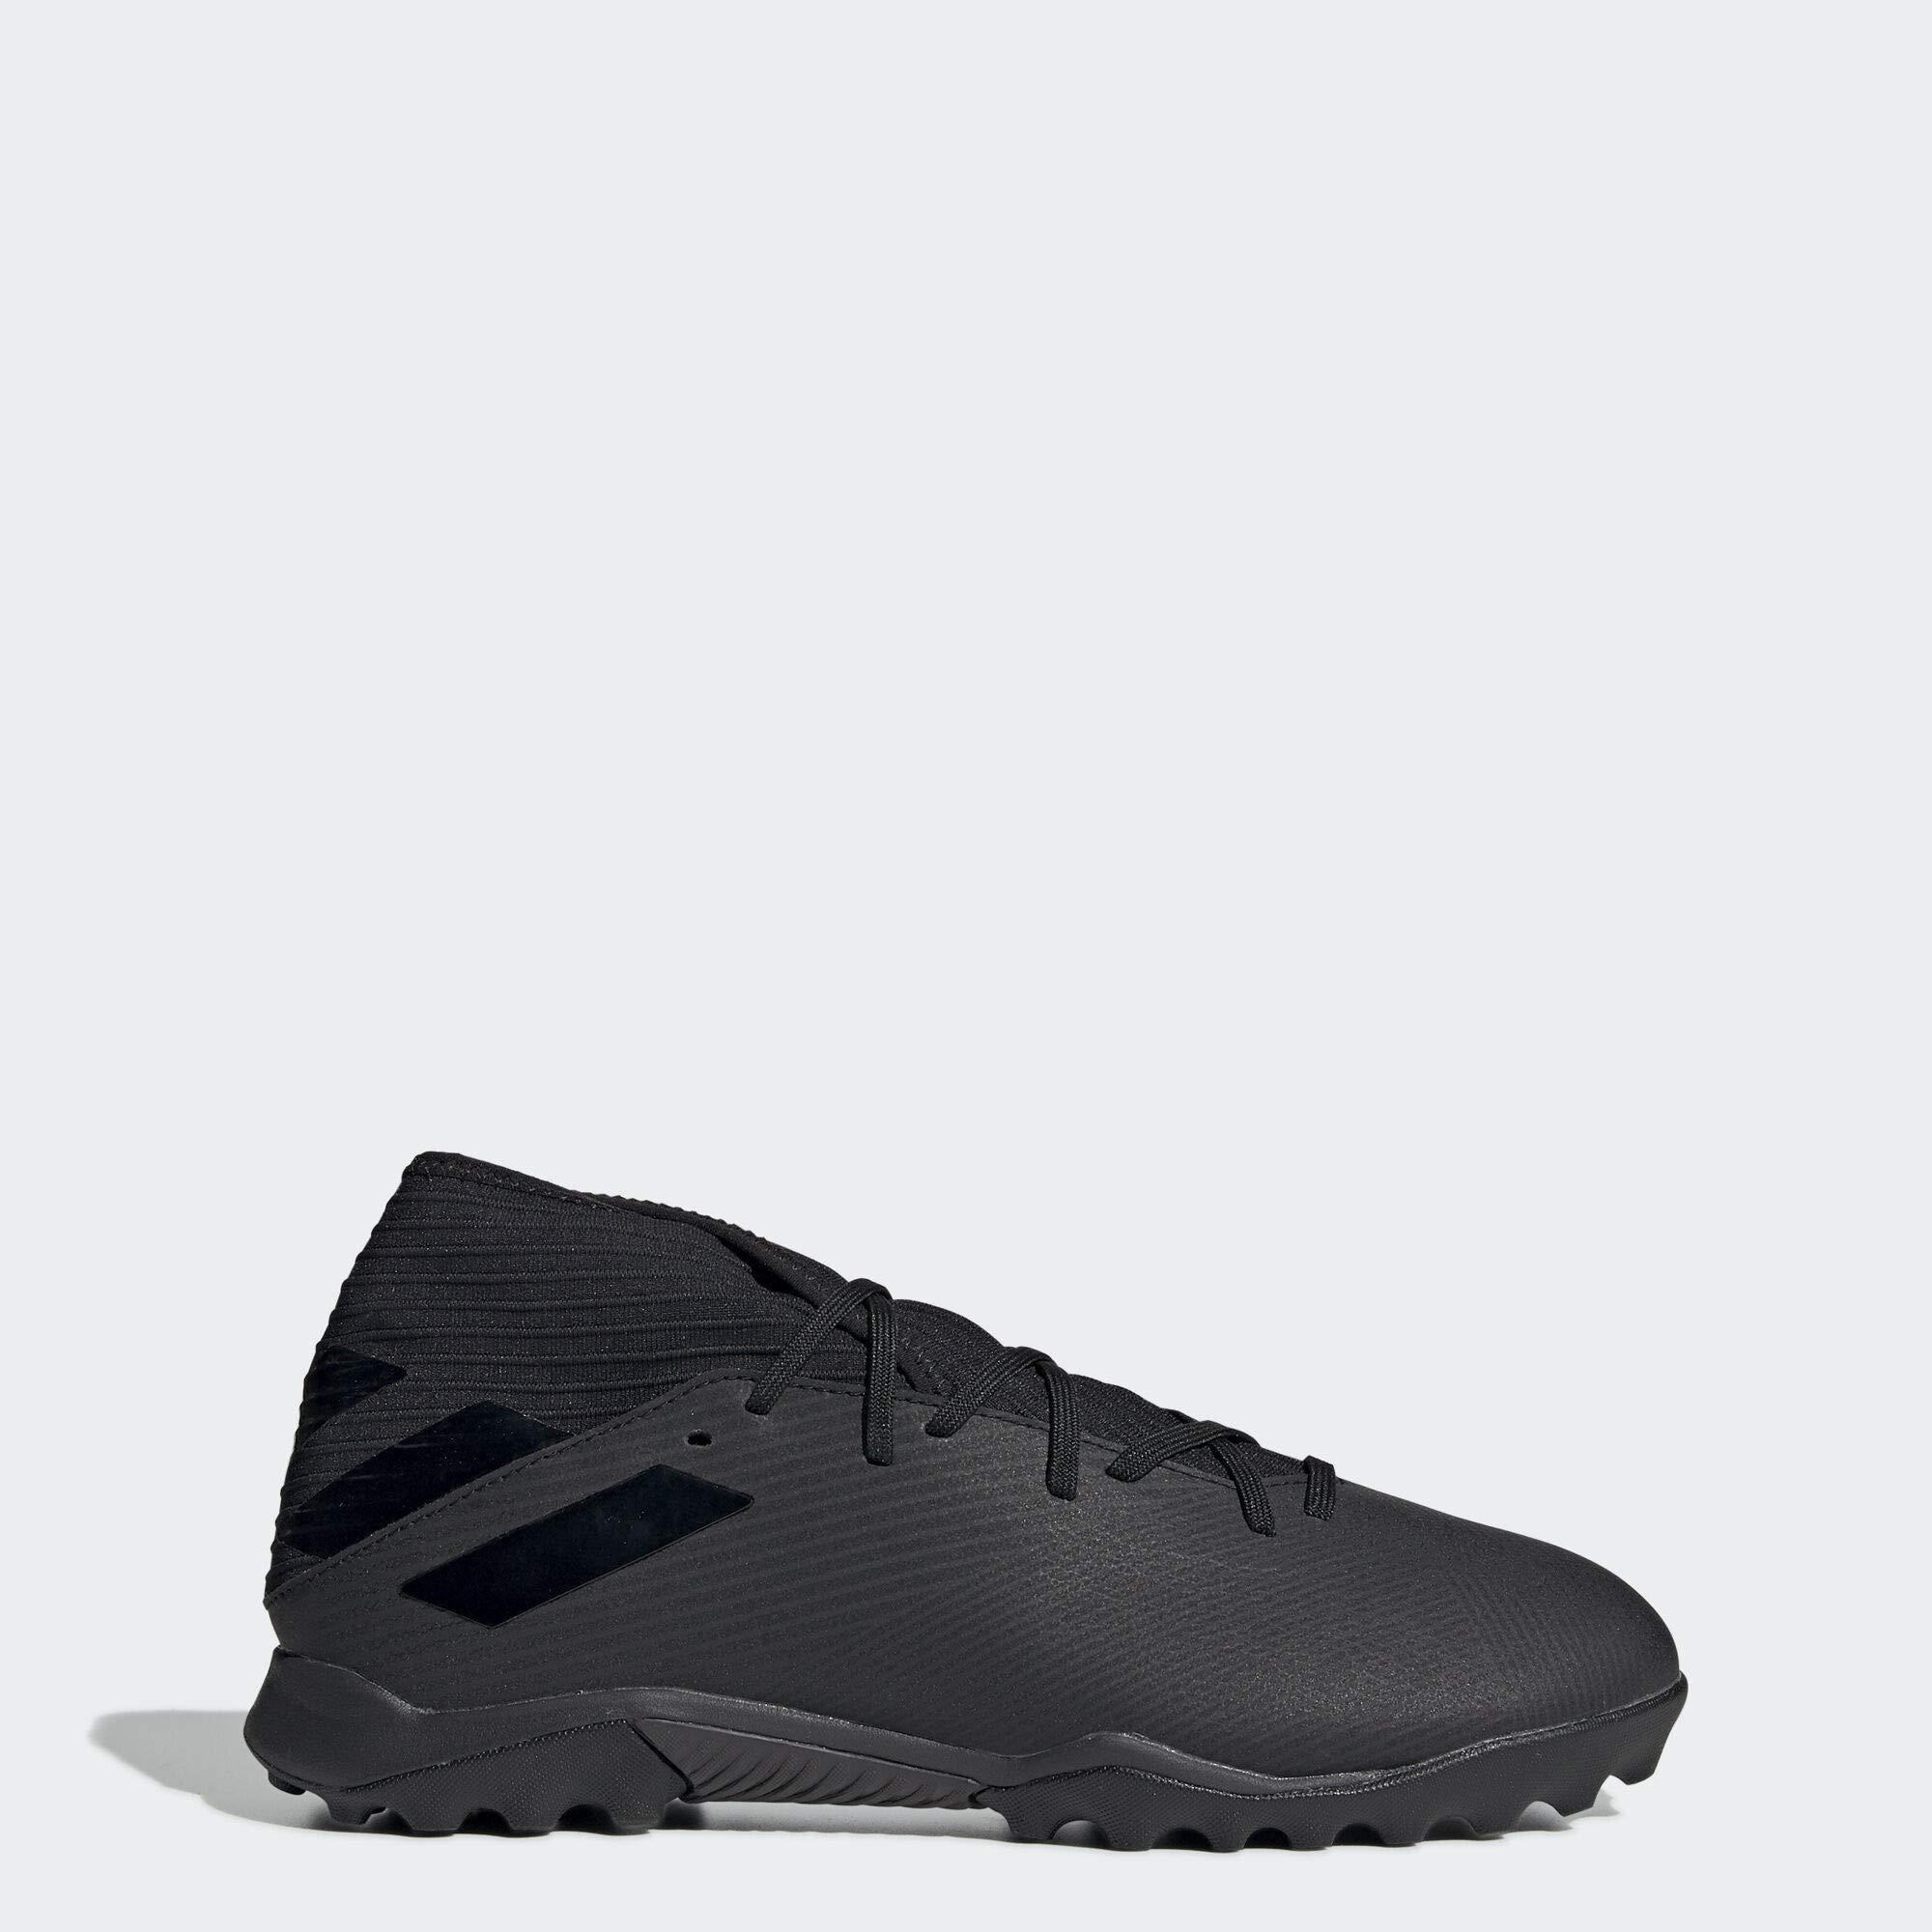 adidas Men's Nemeziz 19.3 Turf Soccer Shoe, Utility Black, 10.5 M US by adidas